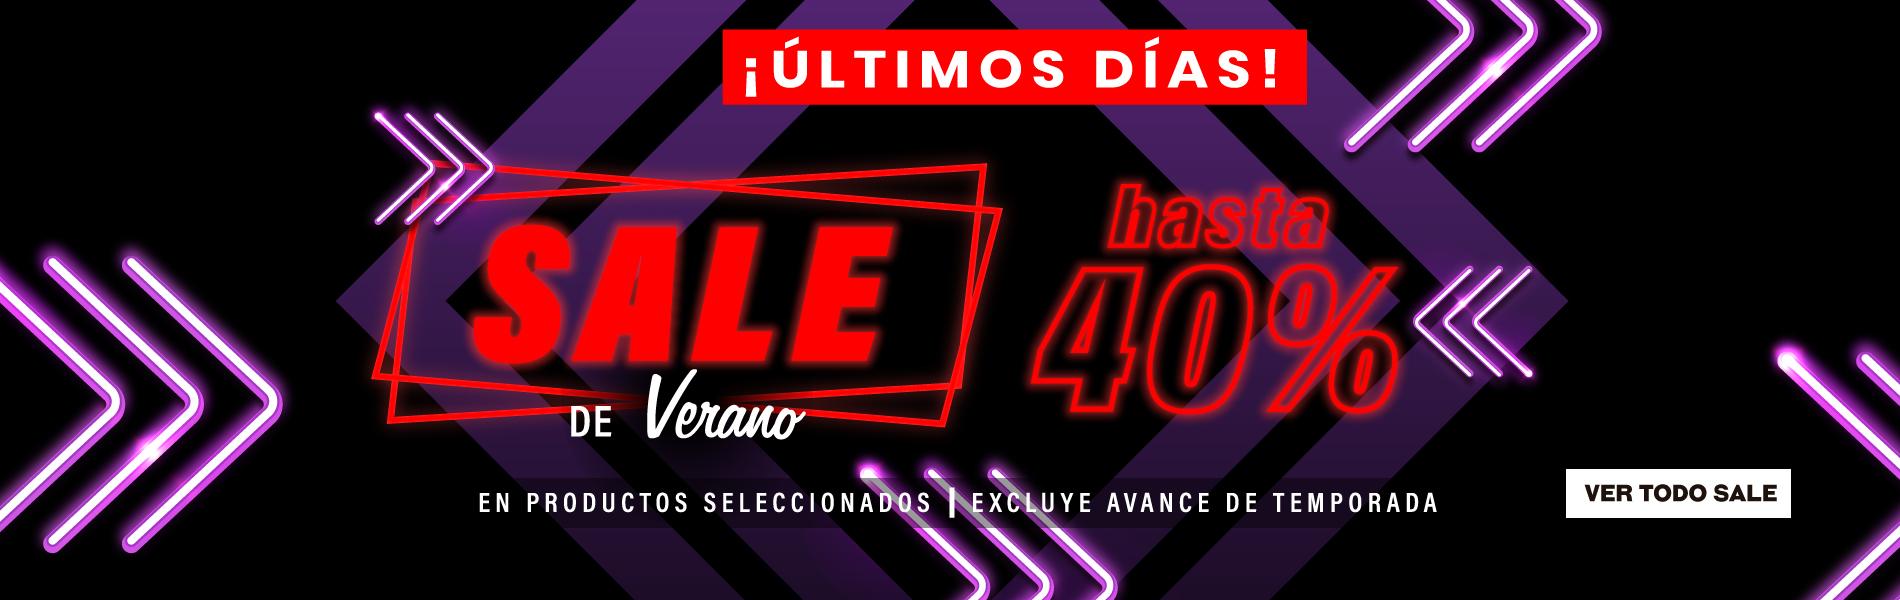 banner-slider-desktop-salecoliseumenero2020